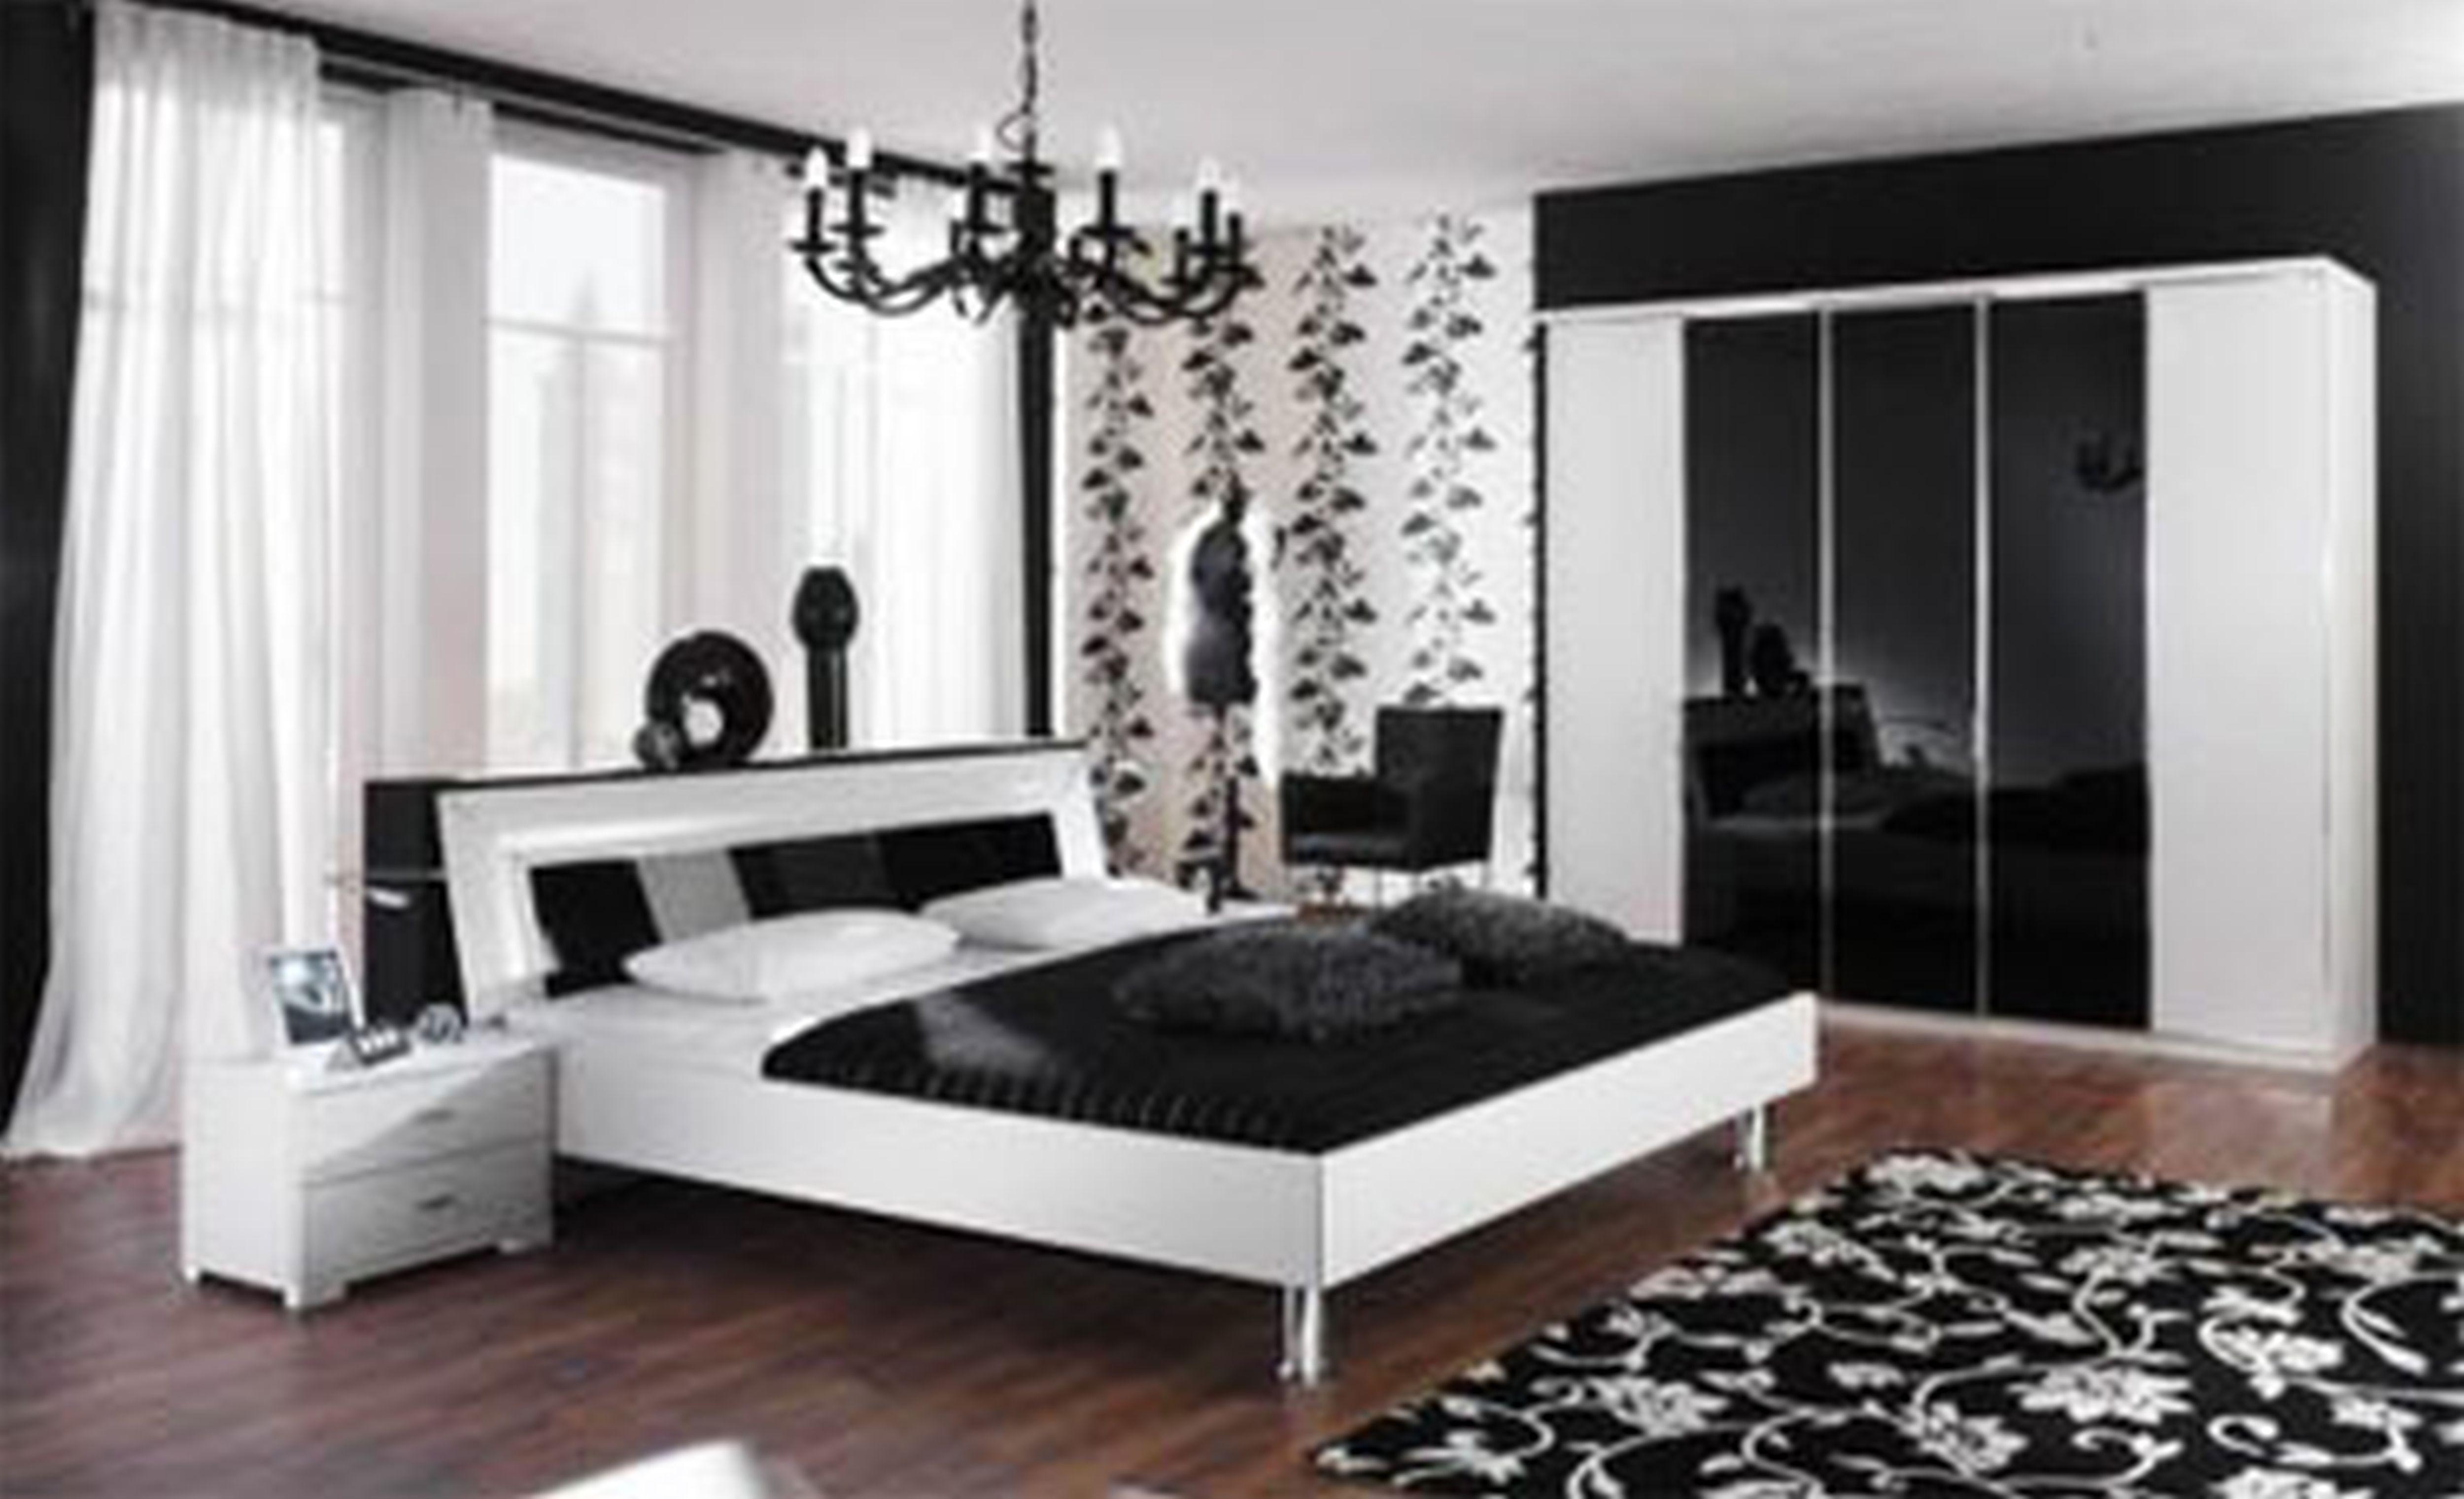 Camere Da Letto Rosse E Bianche : Bedroom large black bedroom furniture ideas vinyl area rugs lamp